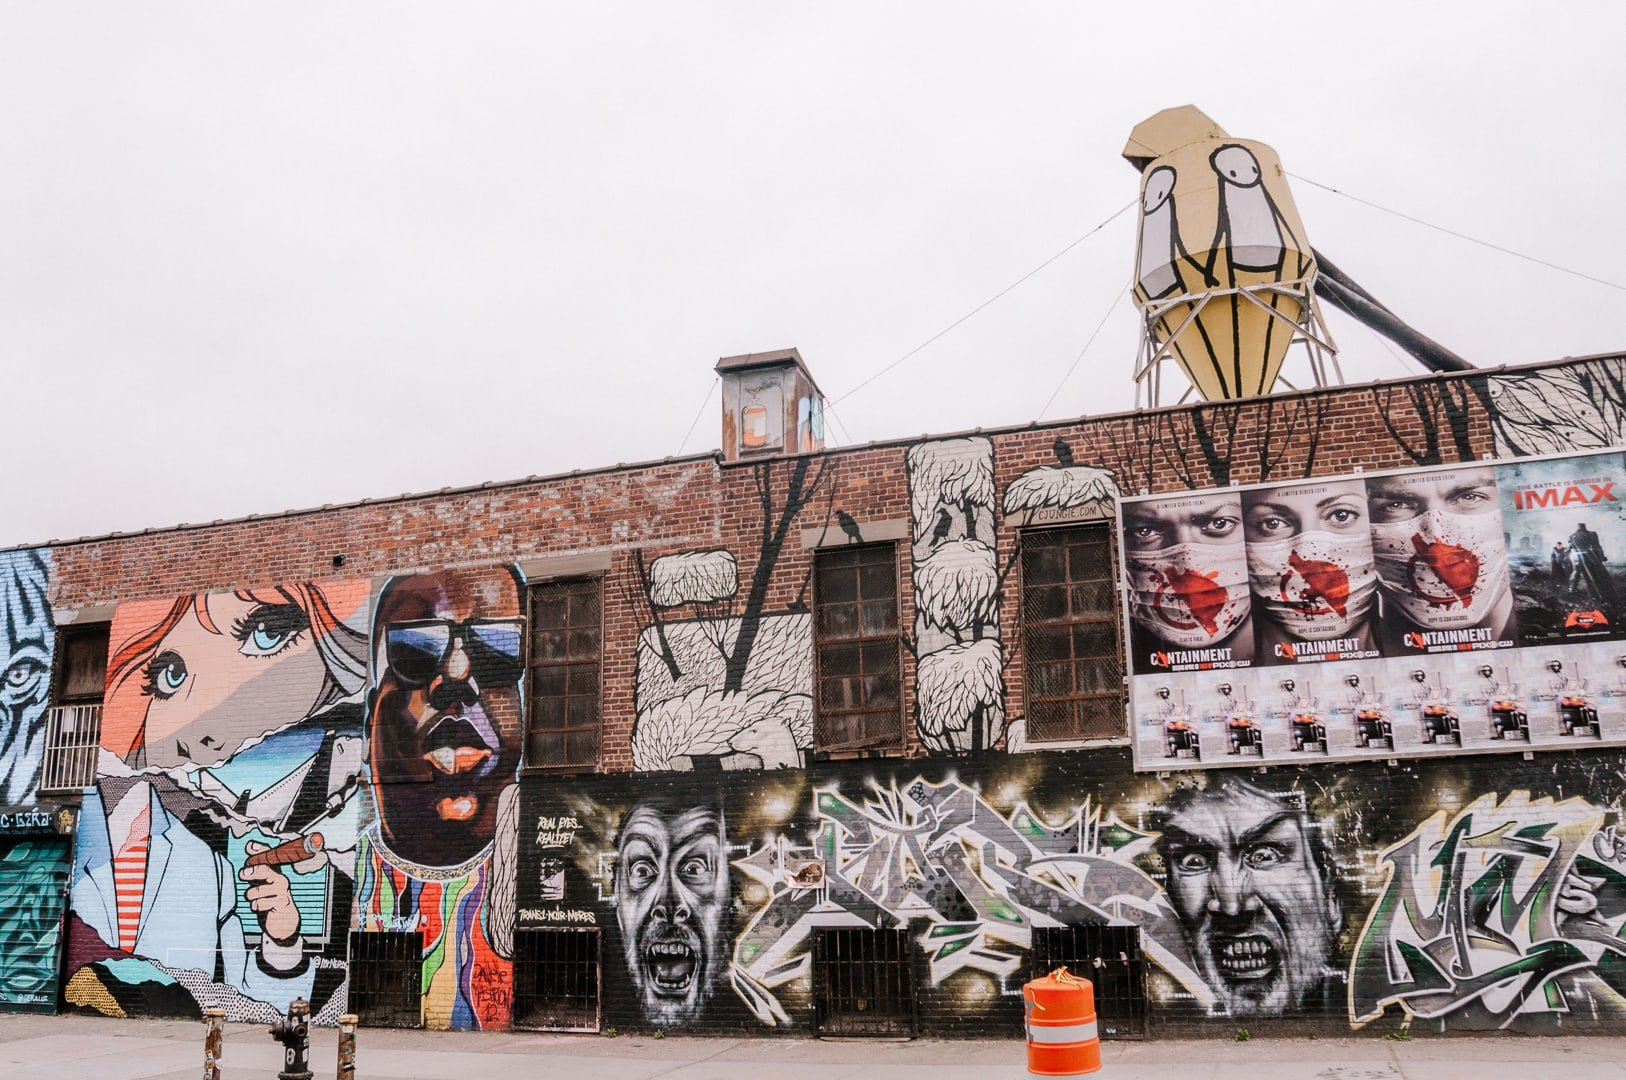 Wall of Bushwick street art at the Bushwick Collective